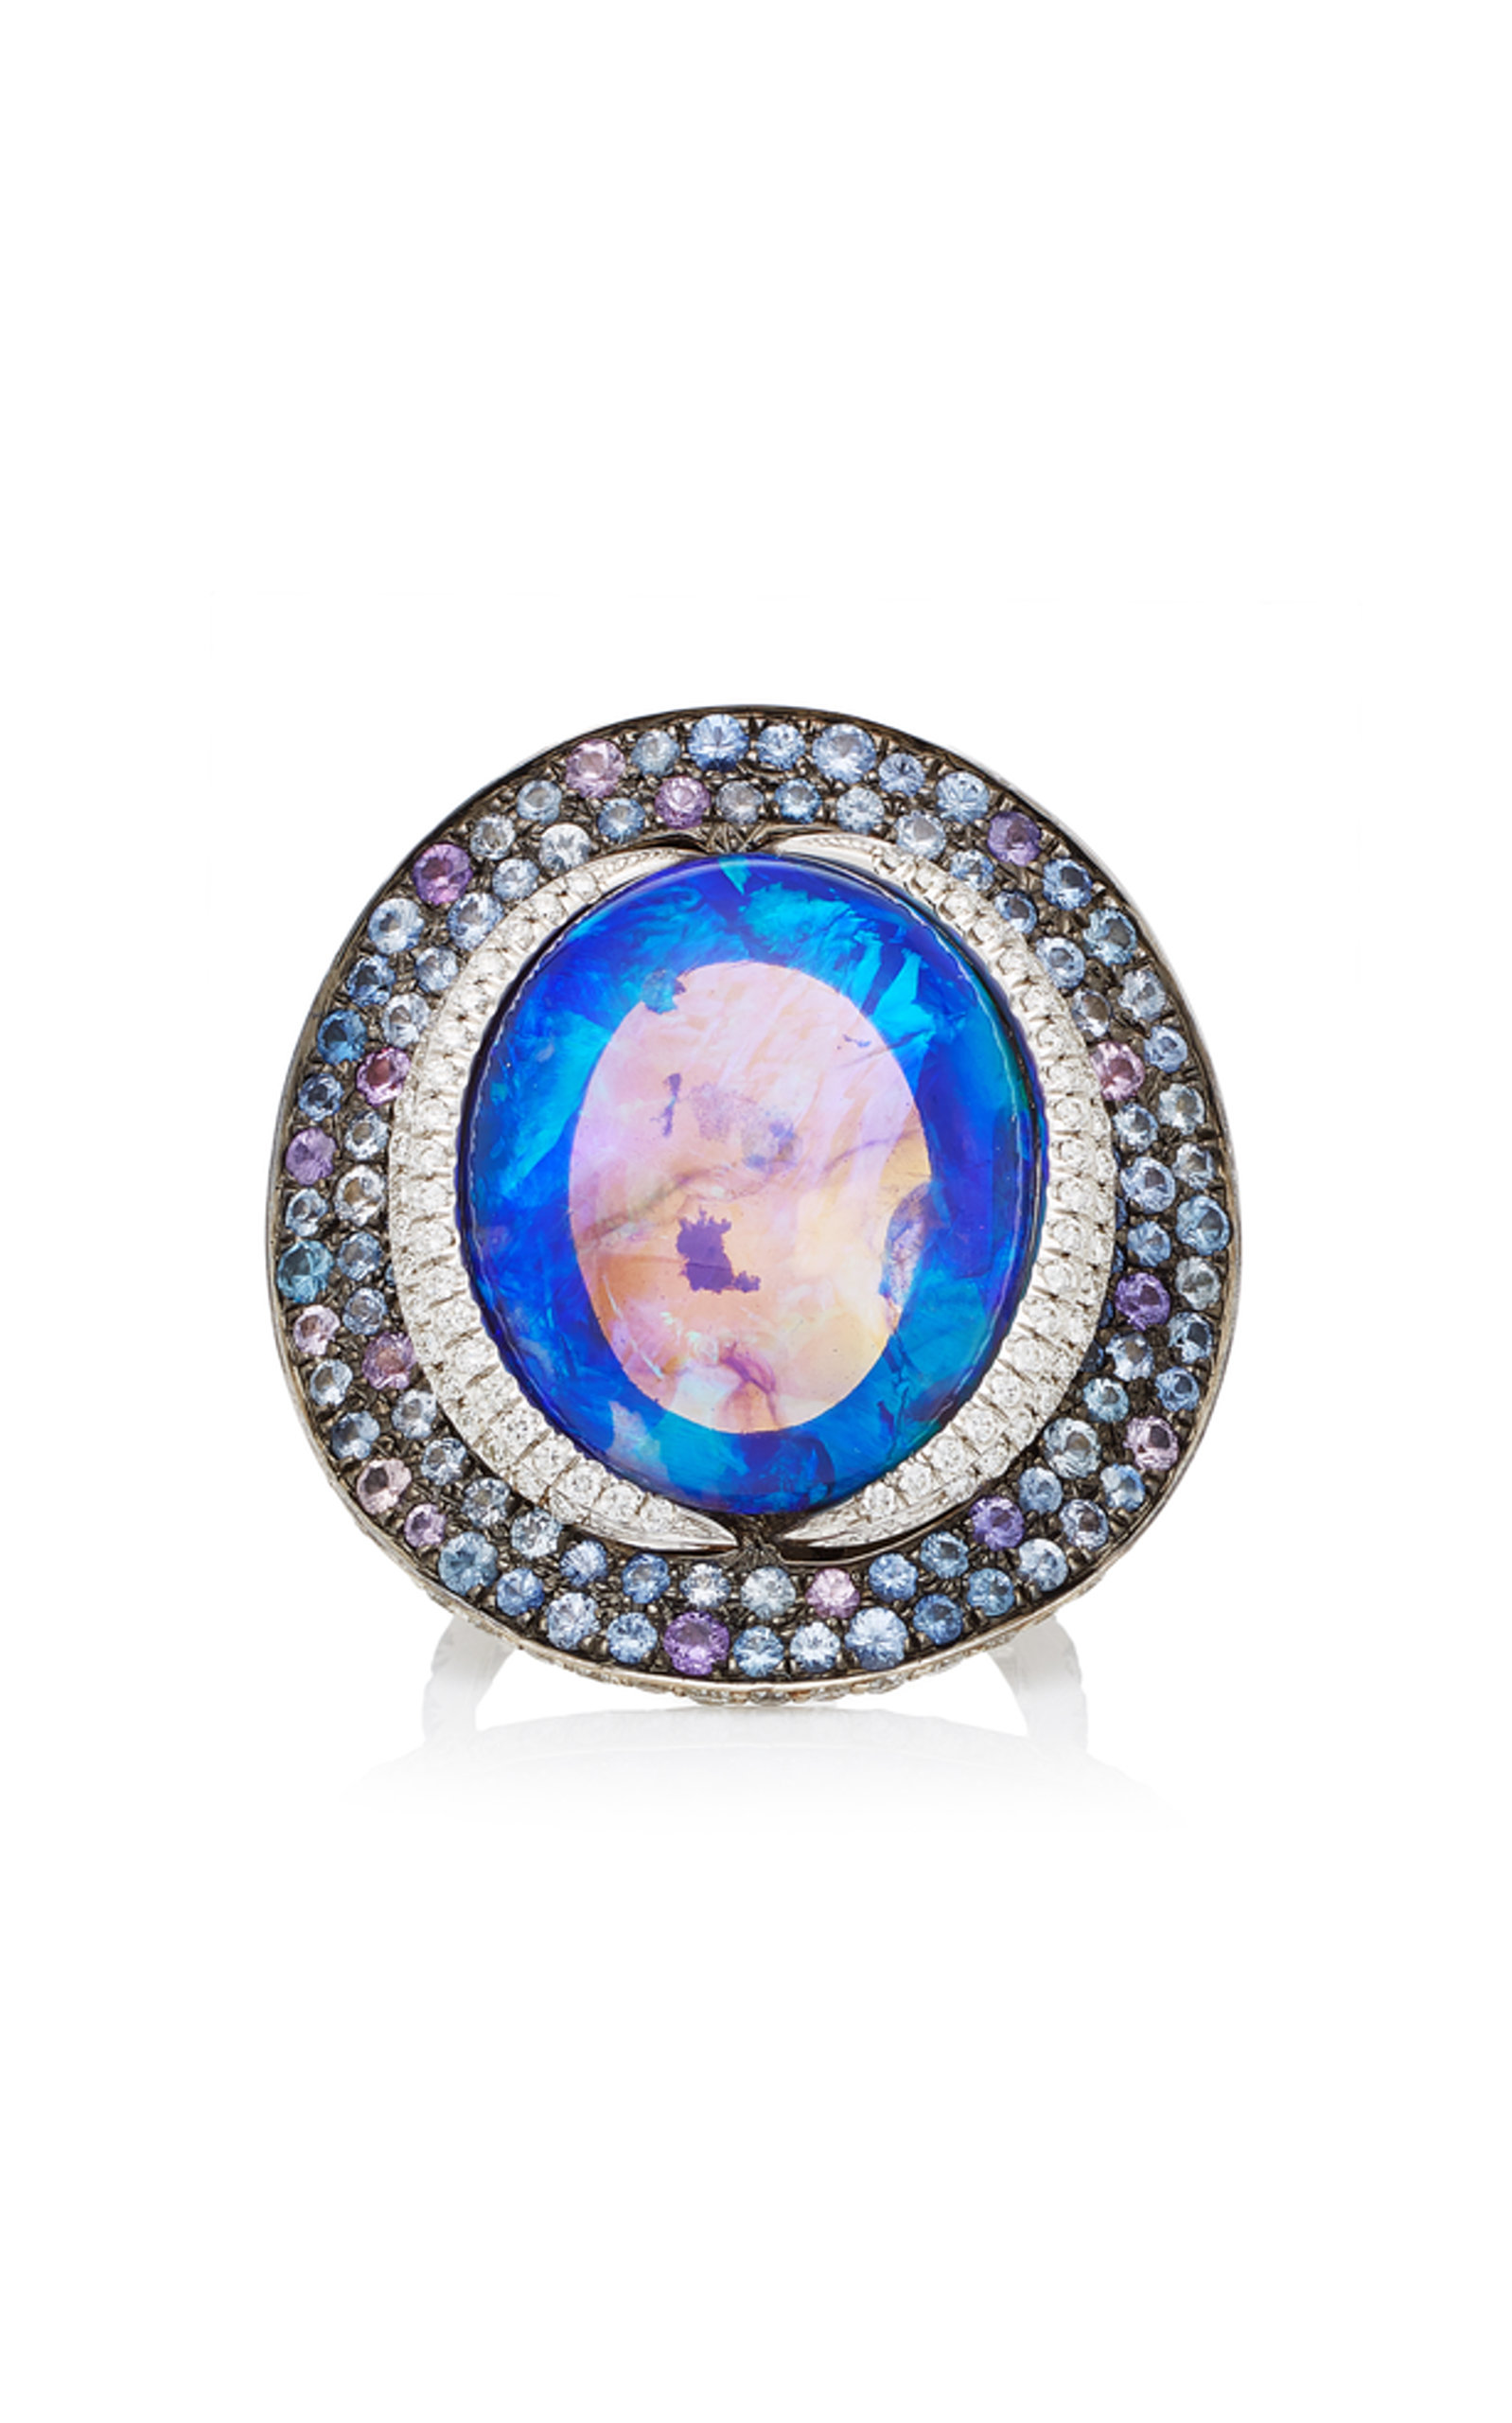 One-Of-A-Kind Black Opal Ring Katherine Jetter X3cpsLihLx